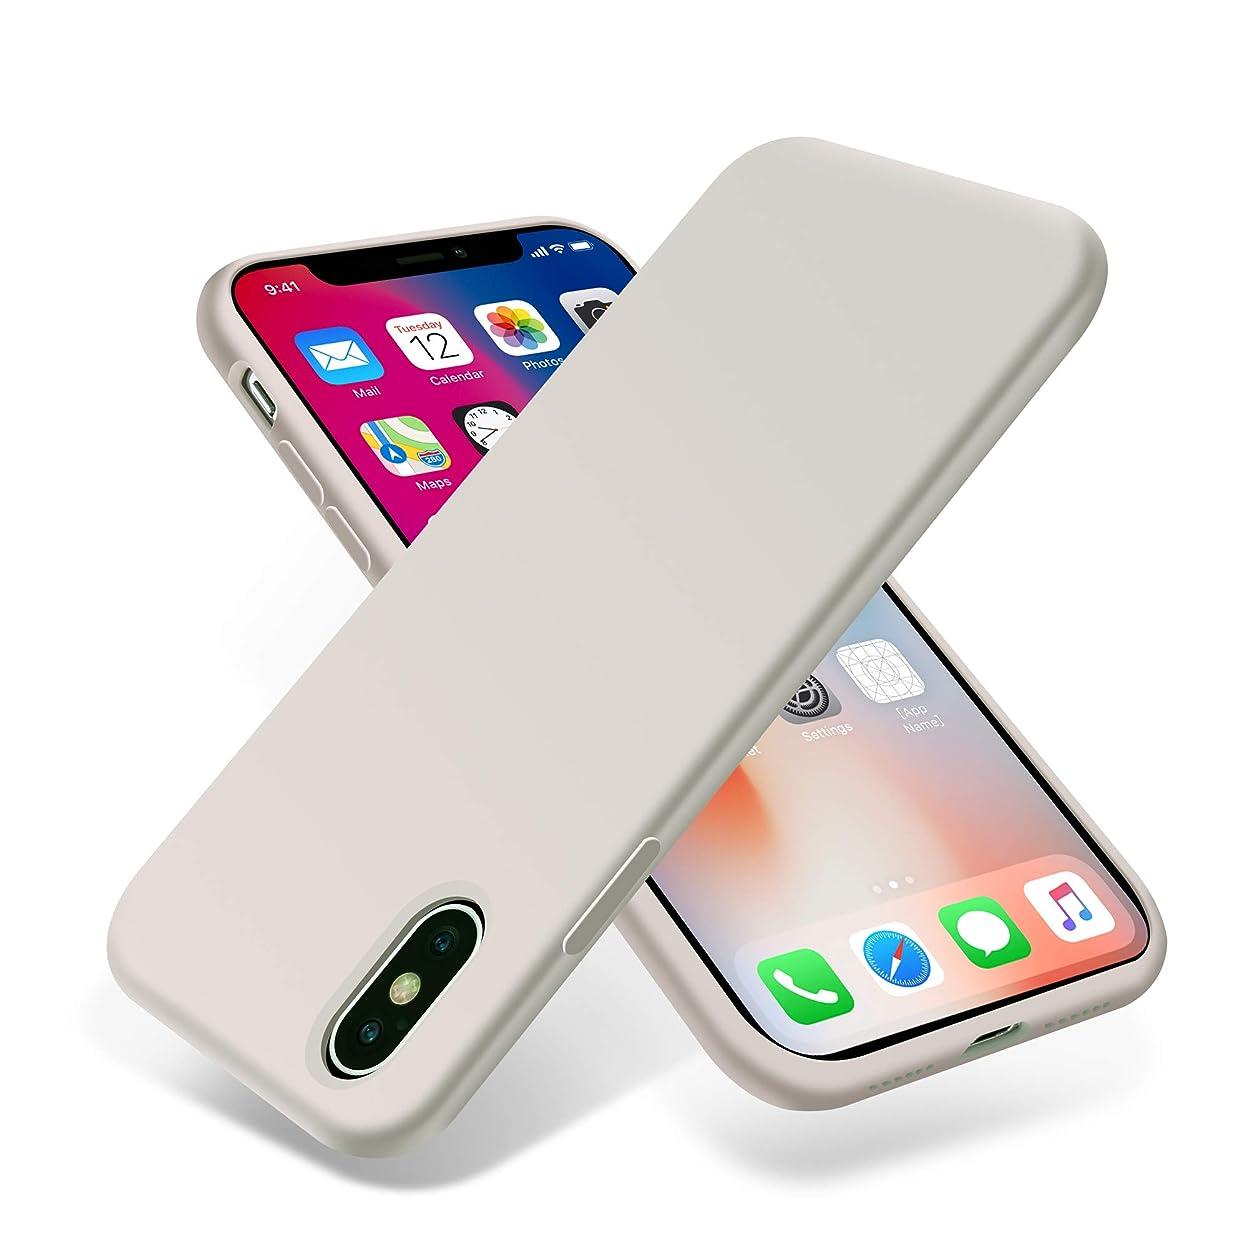 OTOFLY iPhone Xs ケース/iPhone X ケース ソフト タッチ シリコンケース 薄型 超軽量 指紋防止 全面保護 耐衝撃カバー スマホケース iPhoneX ケース/iPhoneXS ケース 対応 (ワイトストーン)